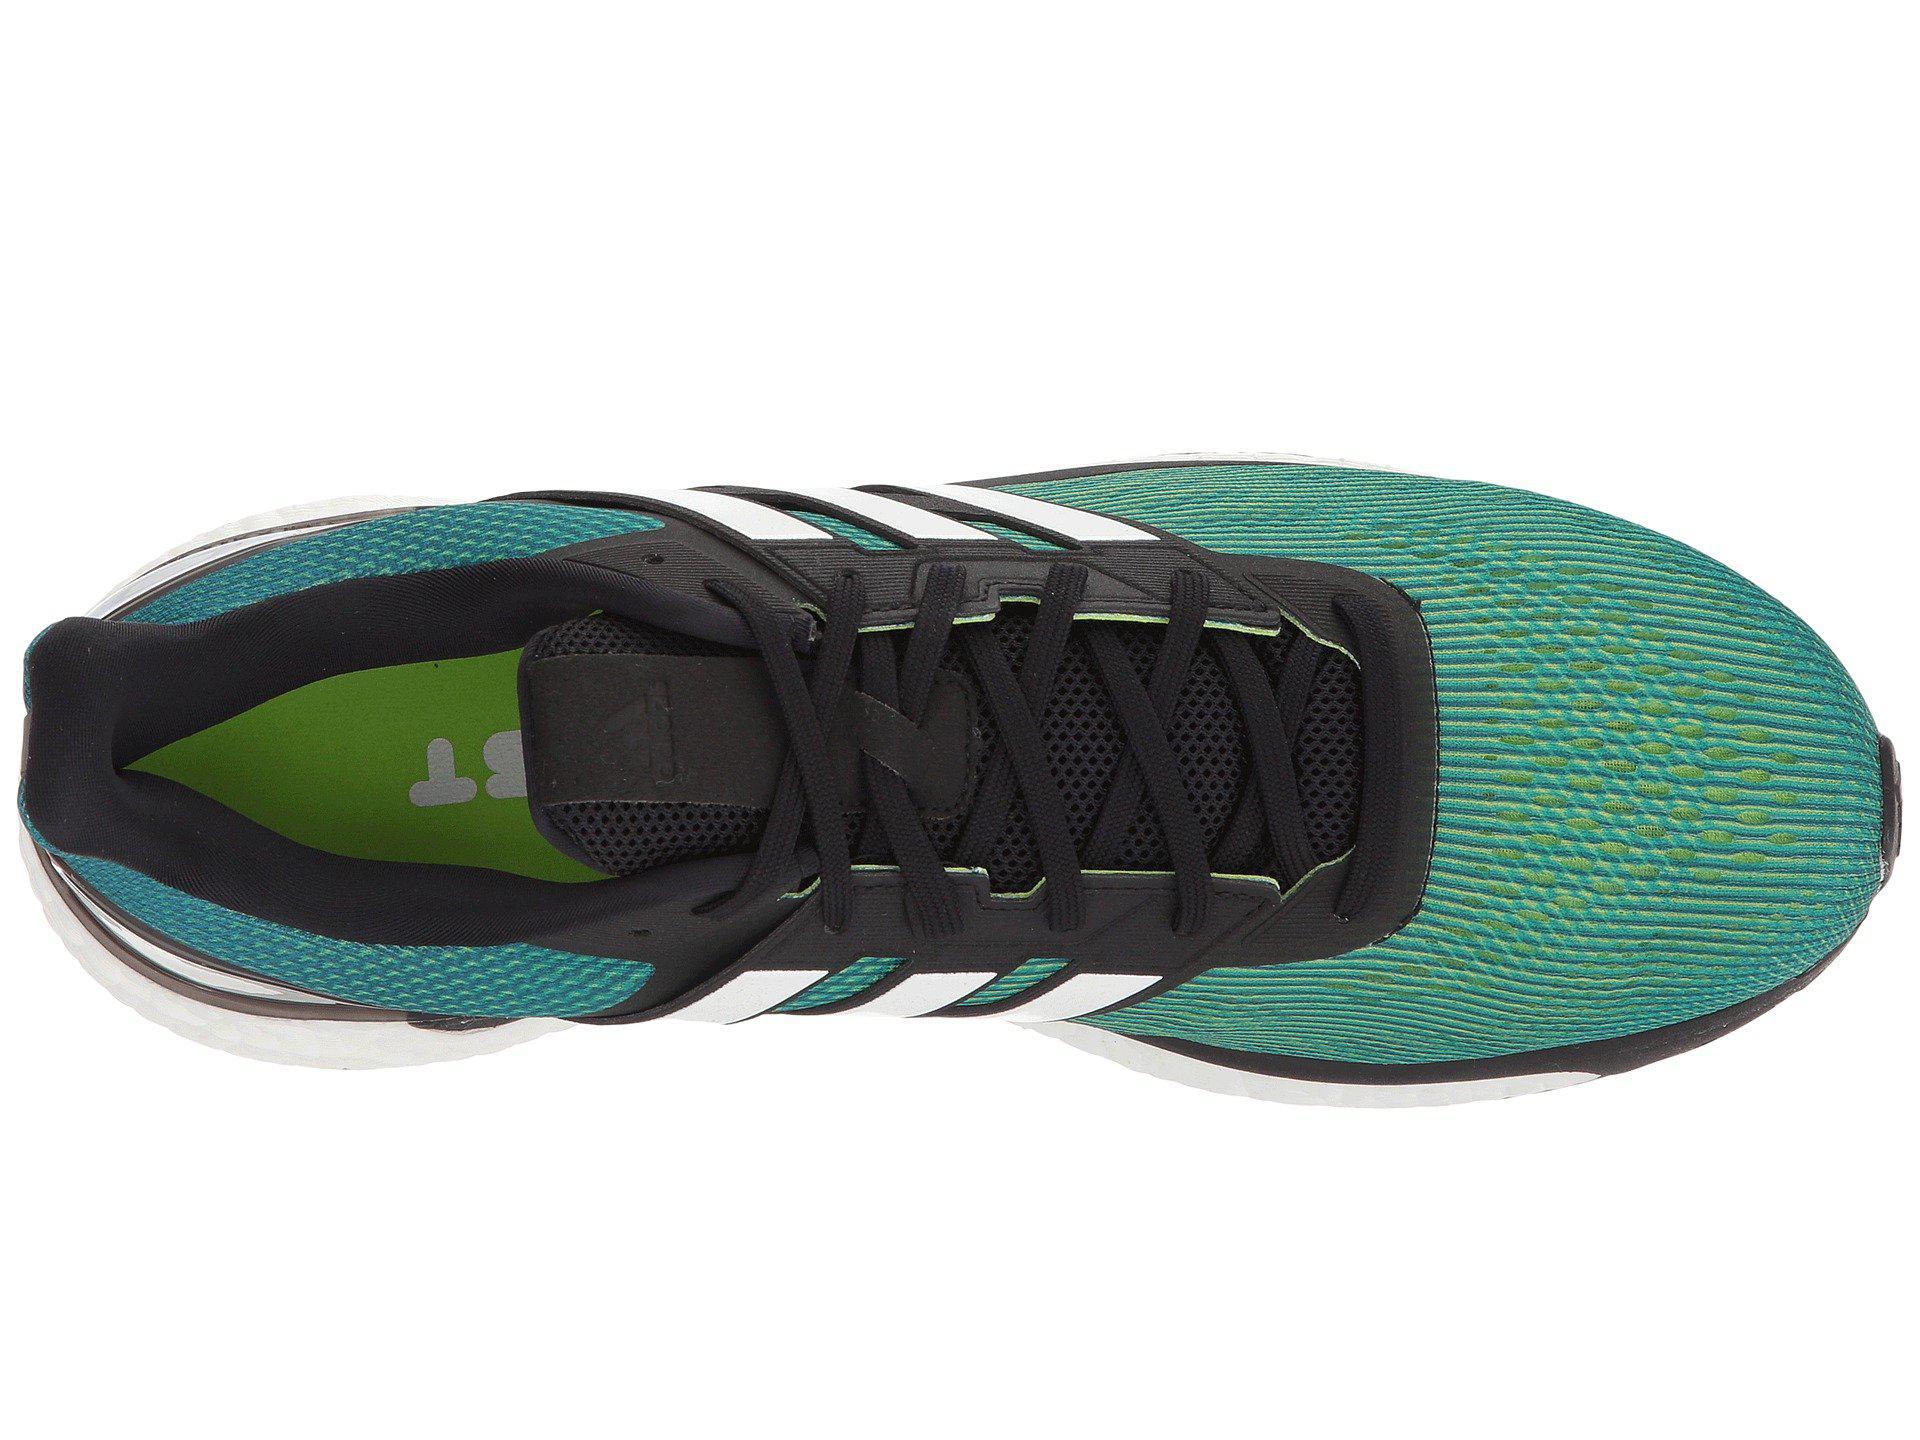 sale retailer 081bf 81685 Lyst - adidas Originals Supernova (solar Slime footwear White hi-res ...